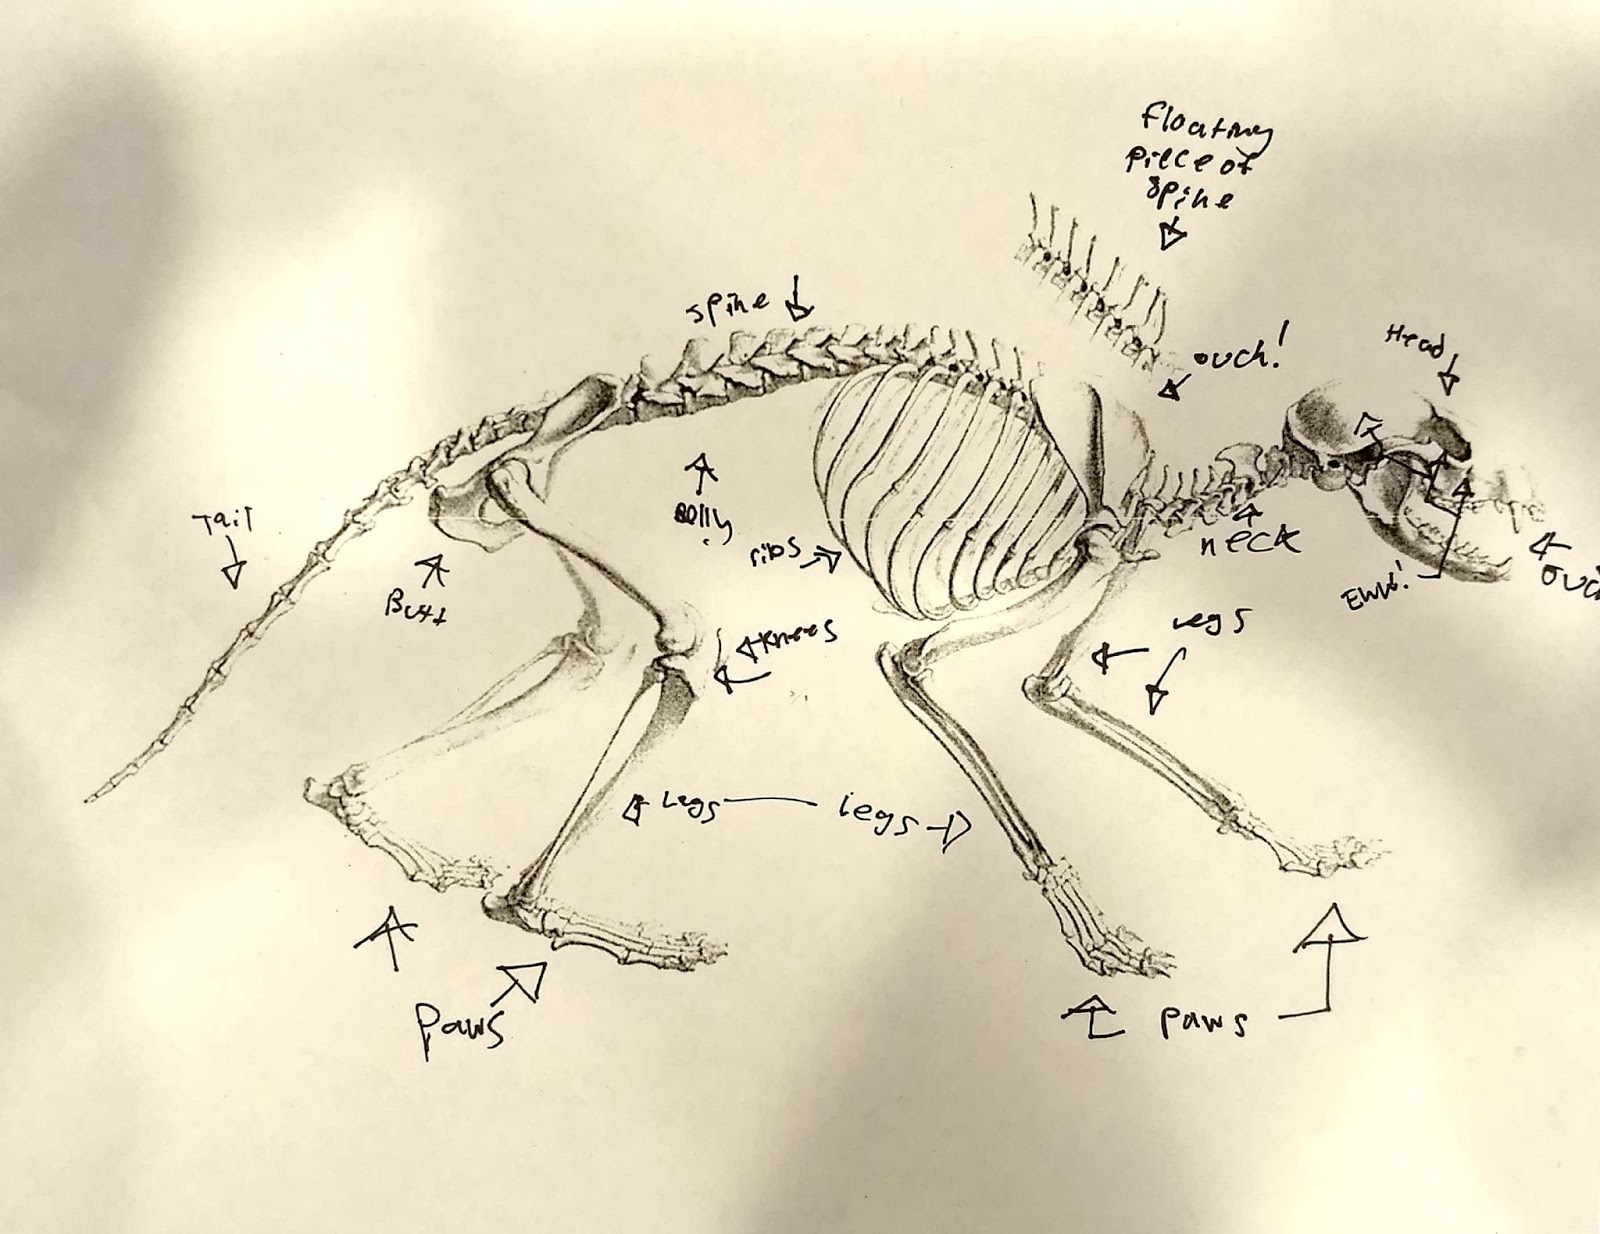 cecilia s labeling of the skeleton diagram  [ 1600 x 1234 Pixel ]